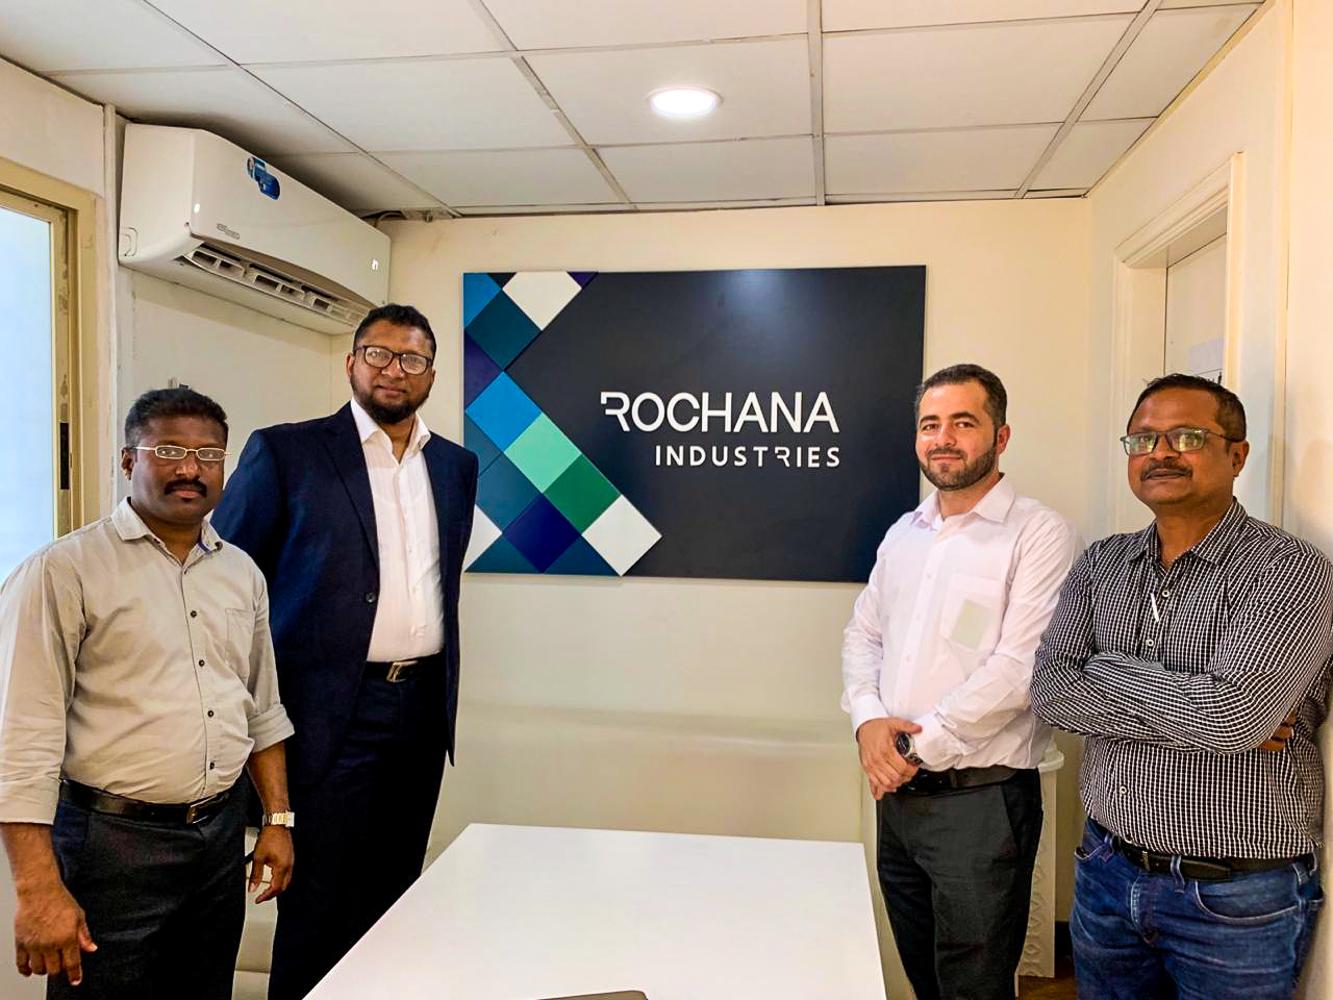 Rochana Industries: Photo 2